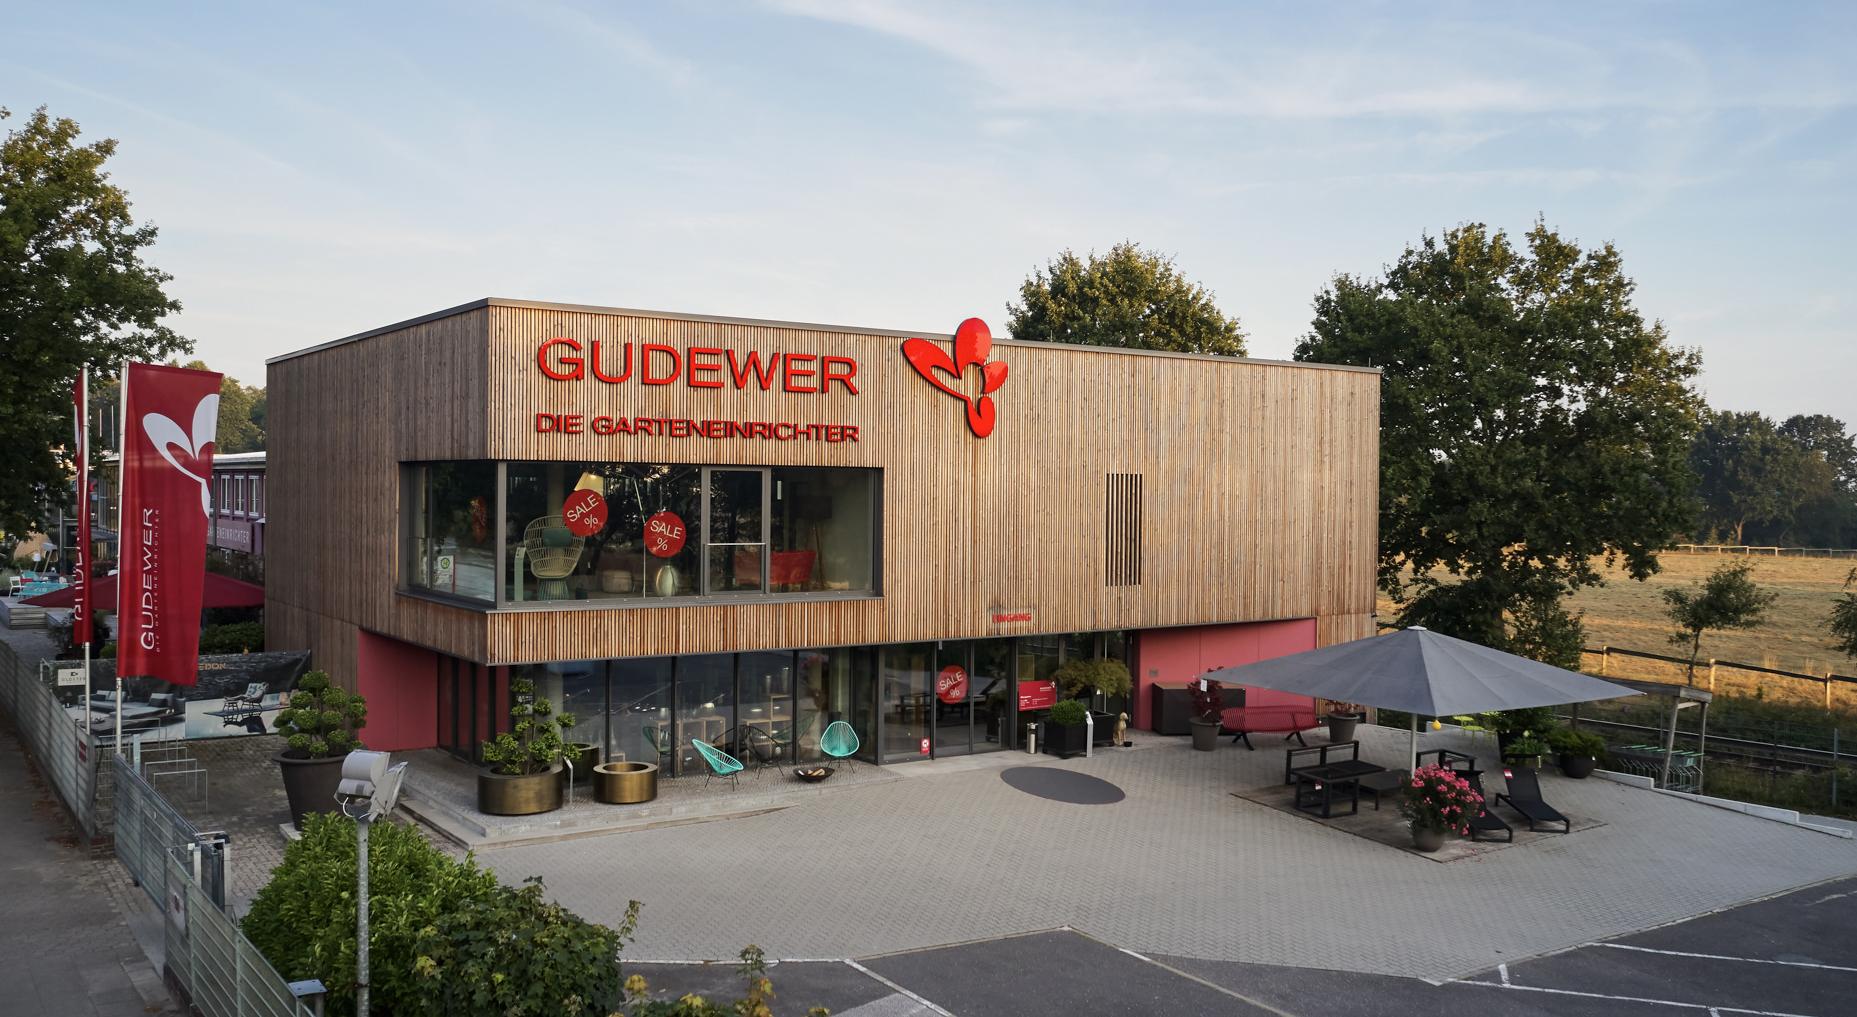 Gudewer Hamburg